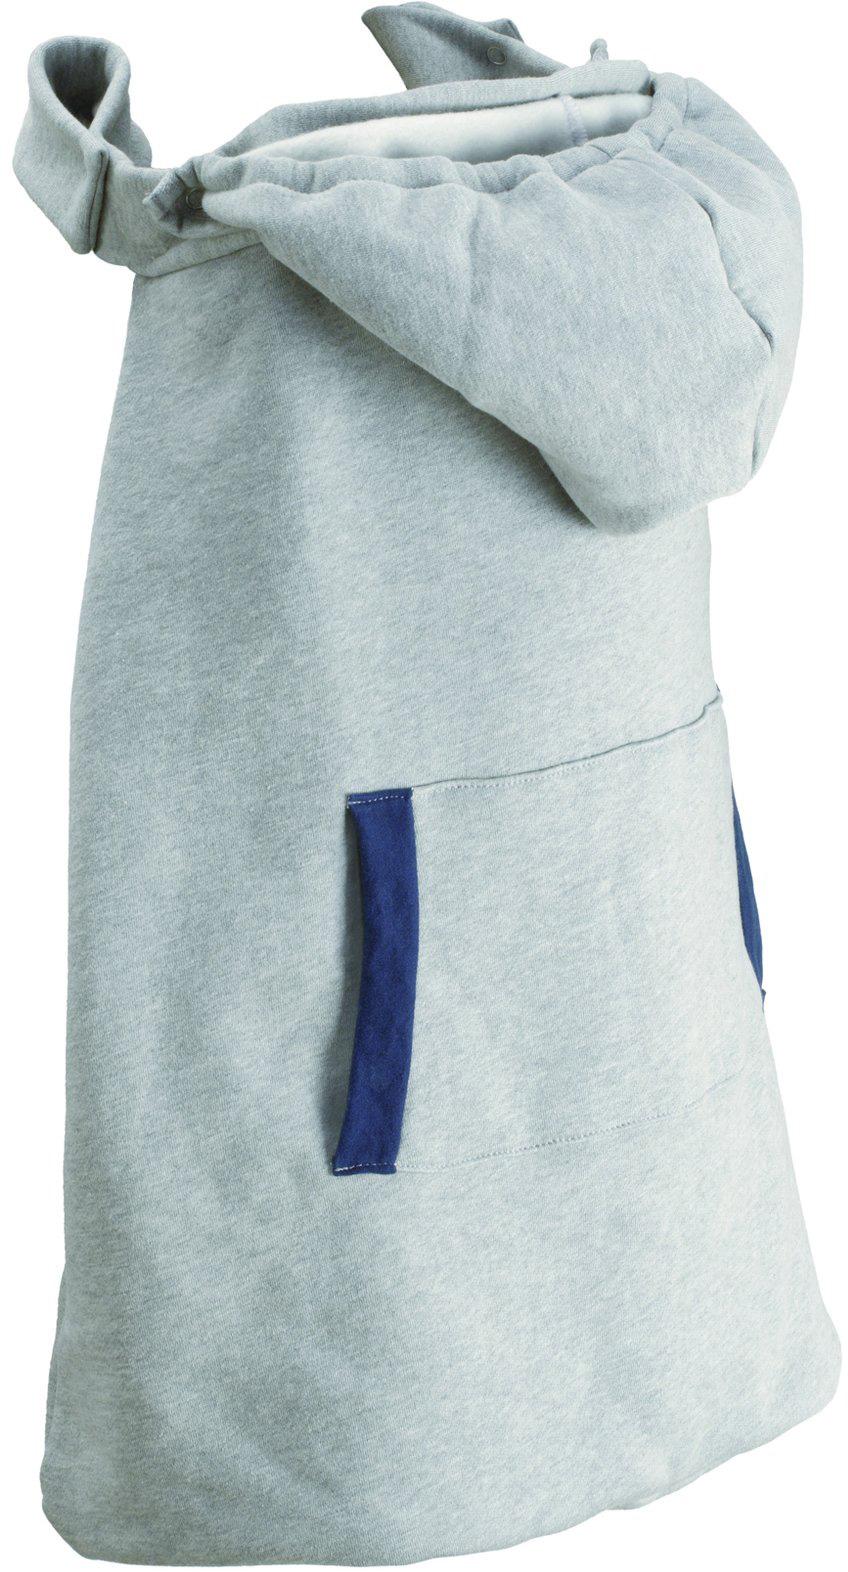 Infantino hoodie